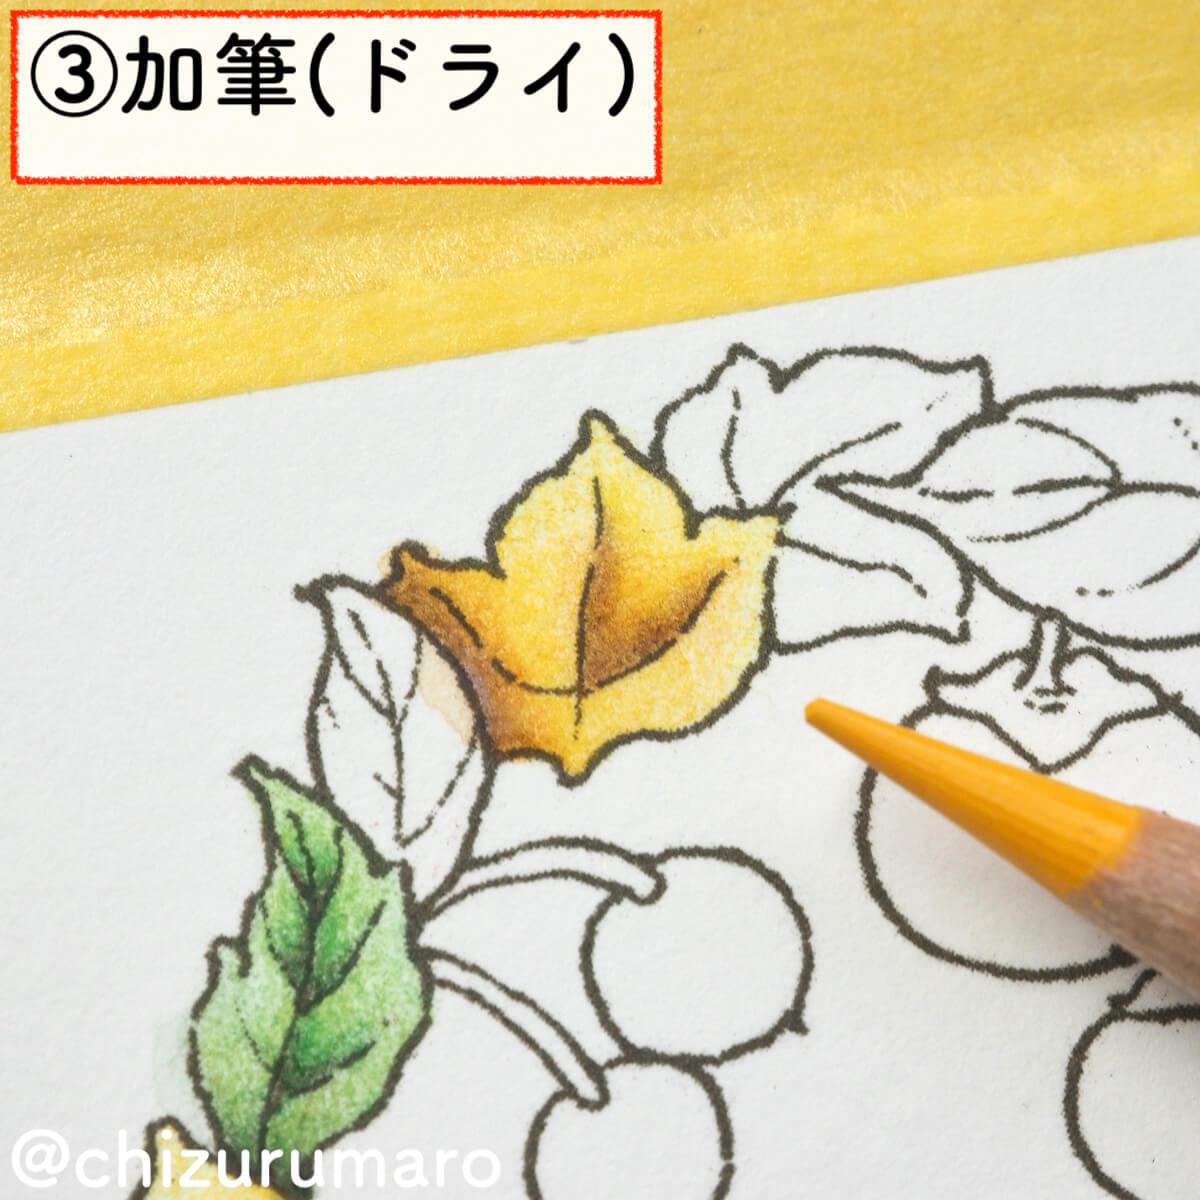 f:id:chizurumaro:20200217144021j:plain